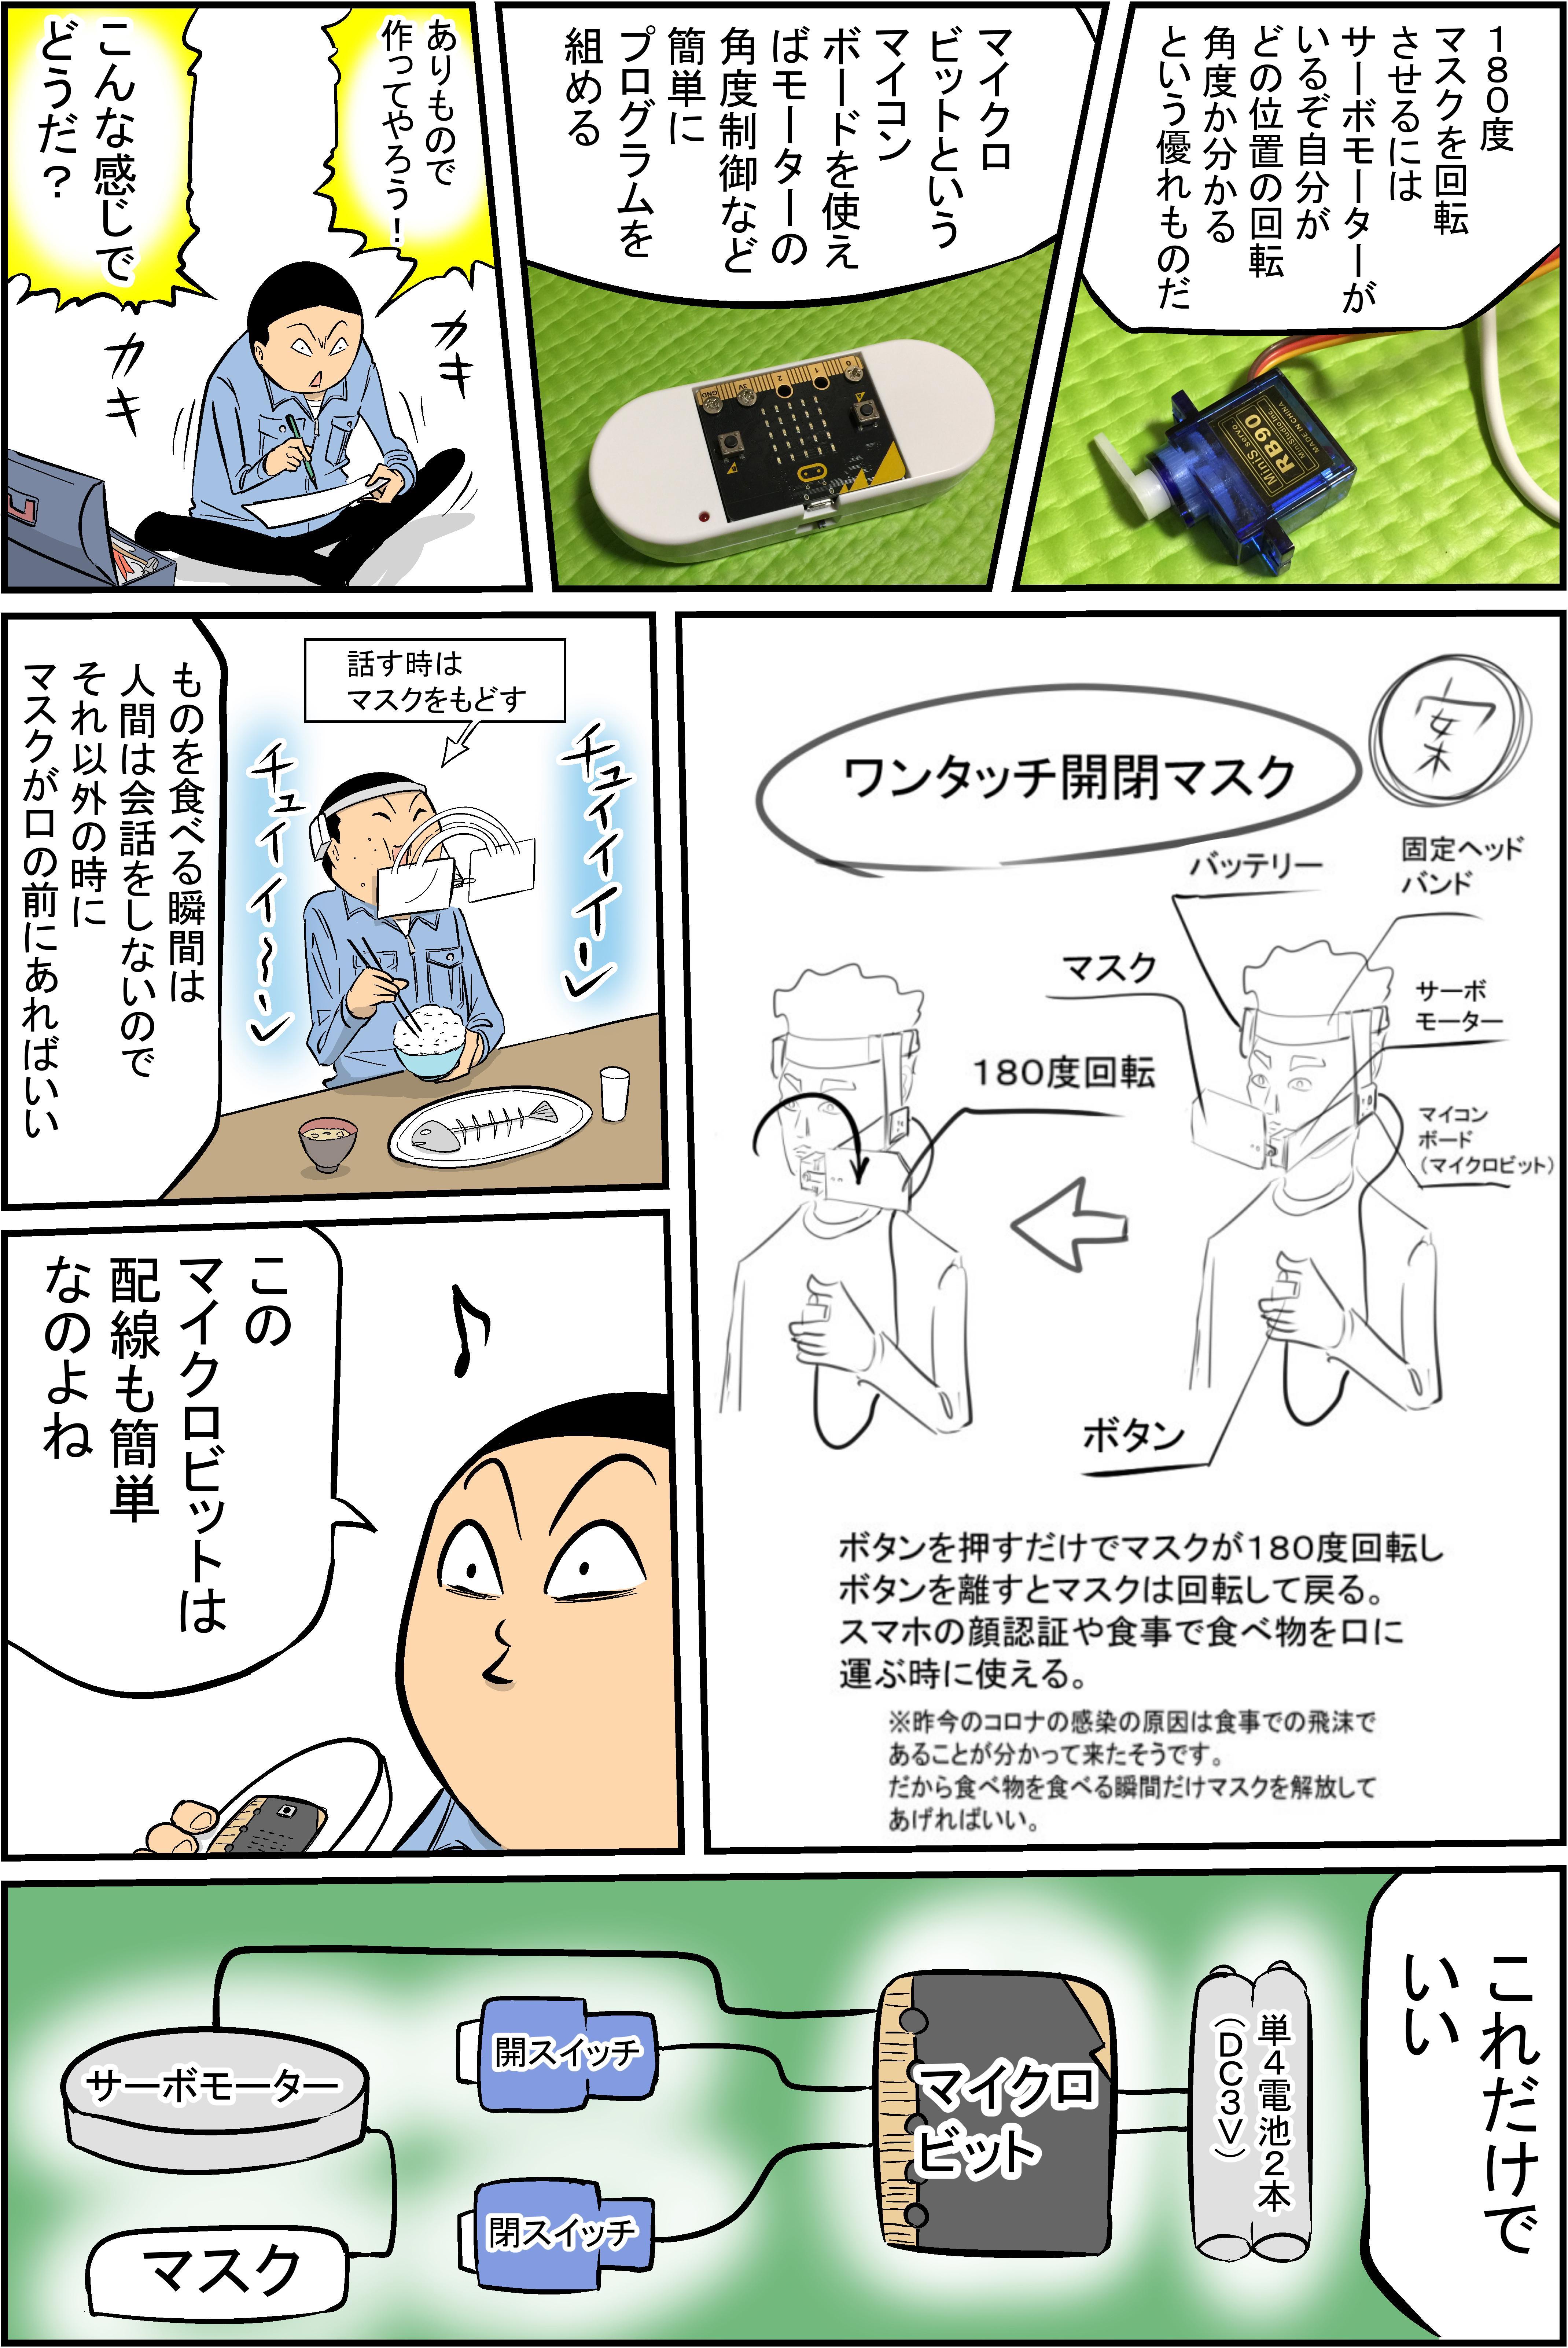 bsm_002-2-04.jpg